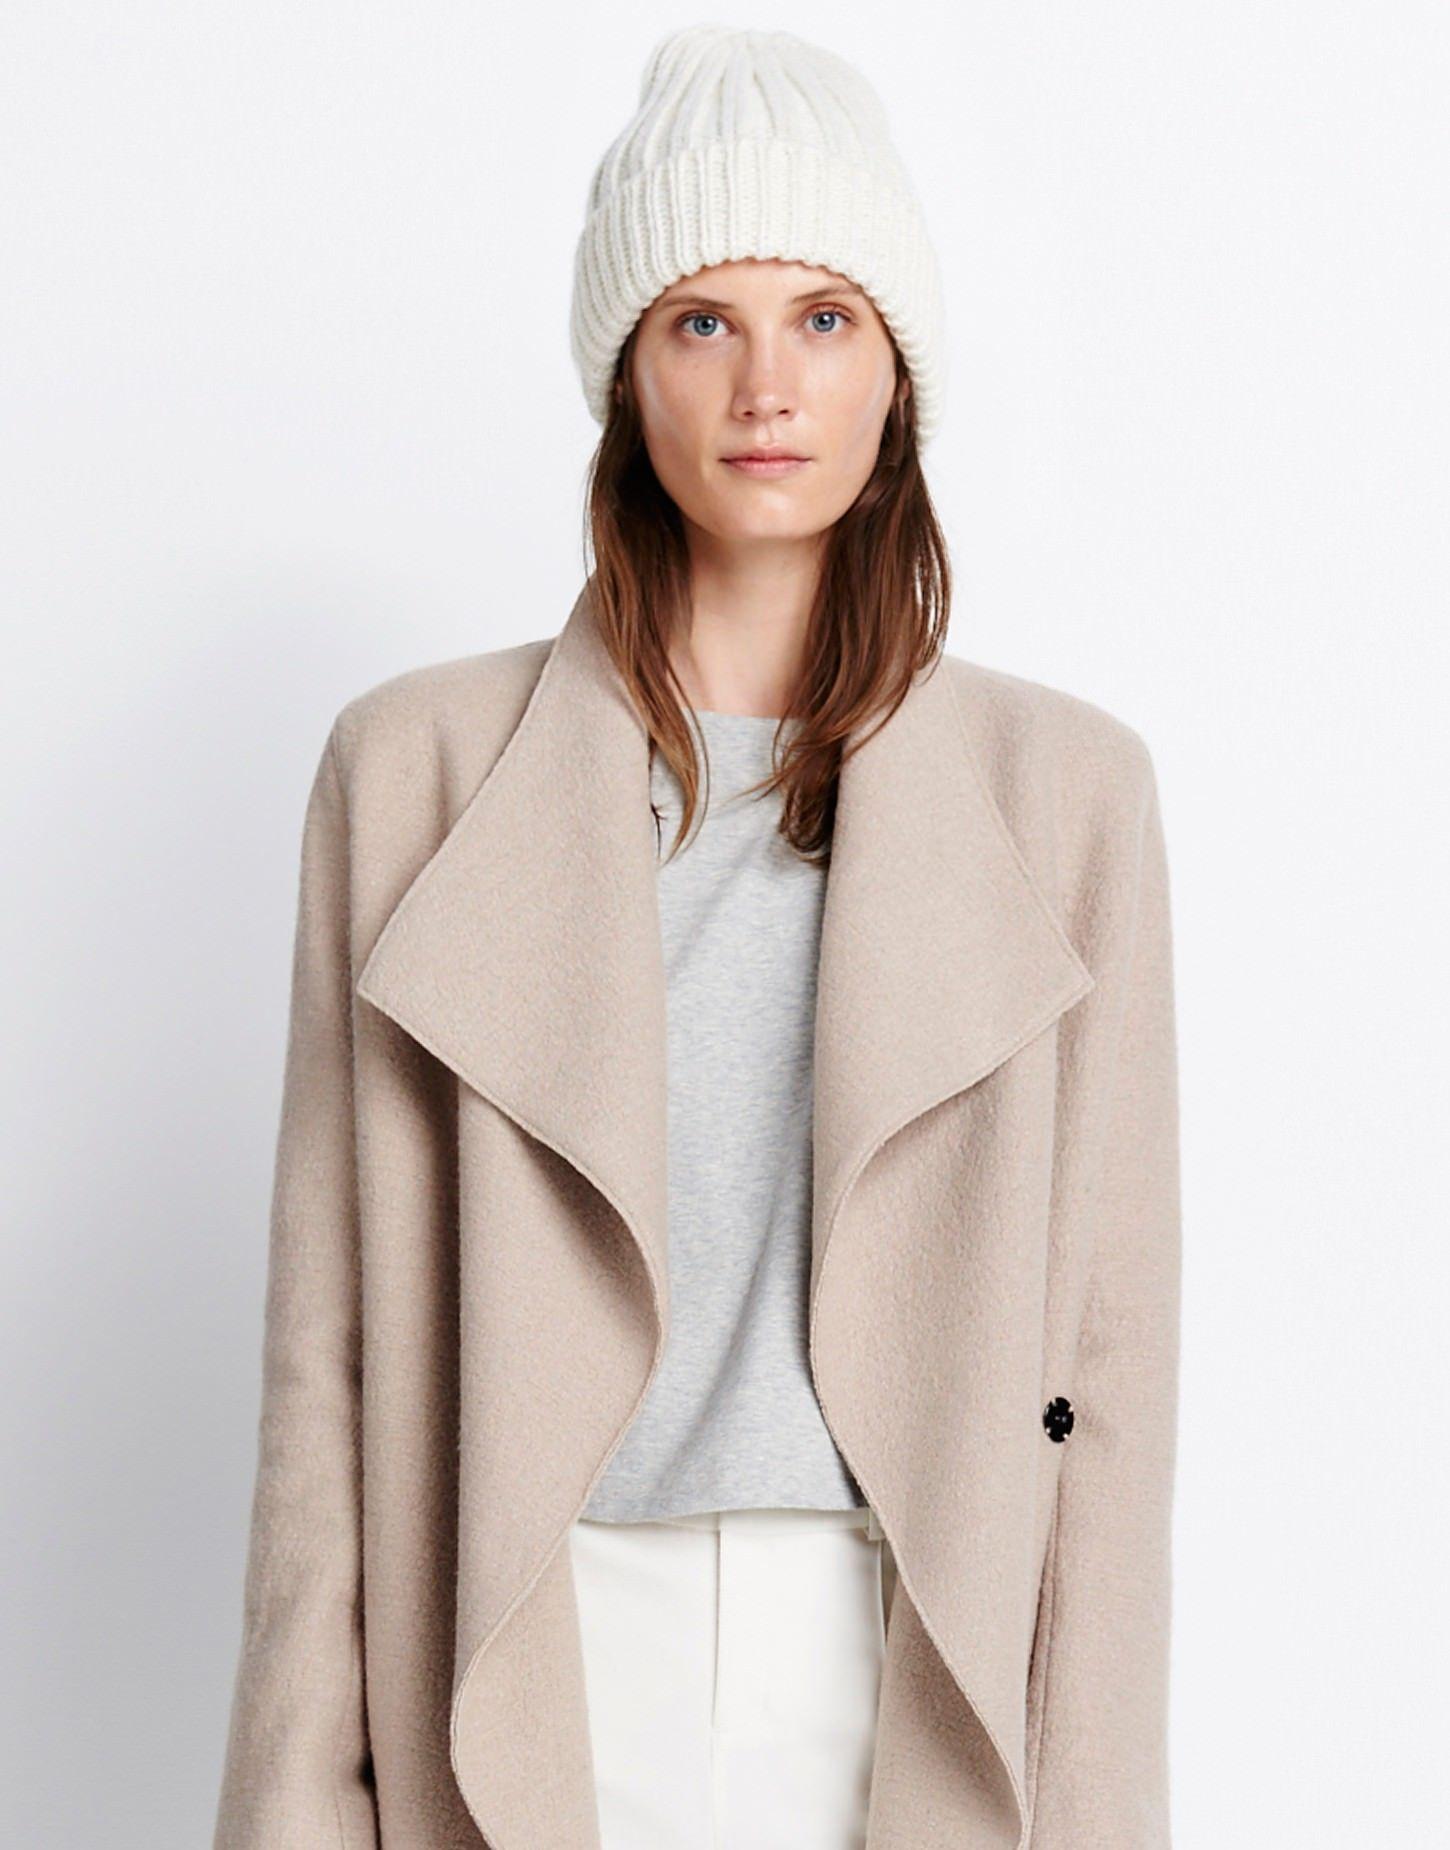 https://static.casual-fashion.com/images/product/de/152x194/3/beige_A__bergangsjacke_damen_valada_someday_vorne_2032.jpg